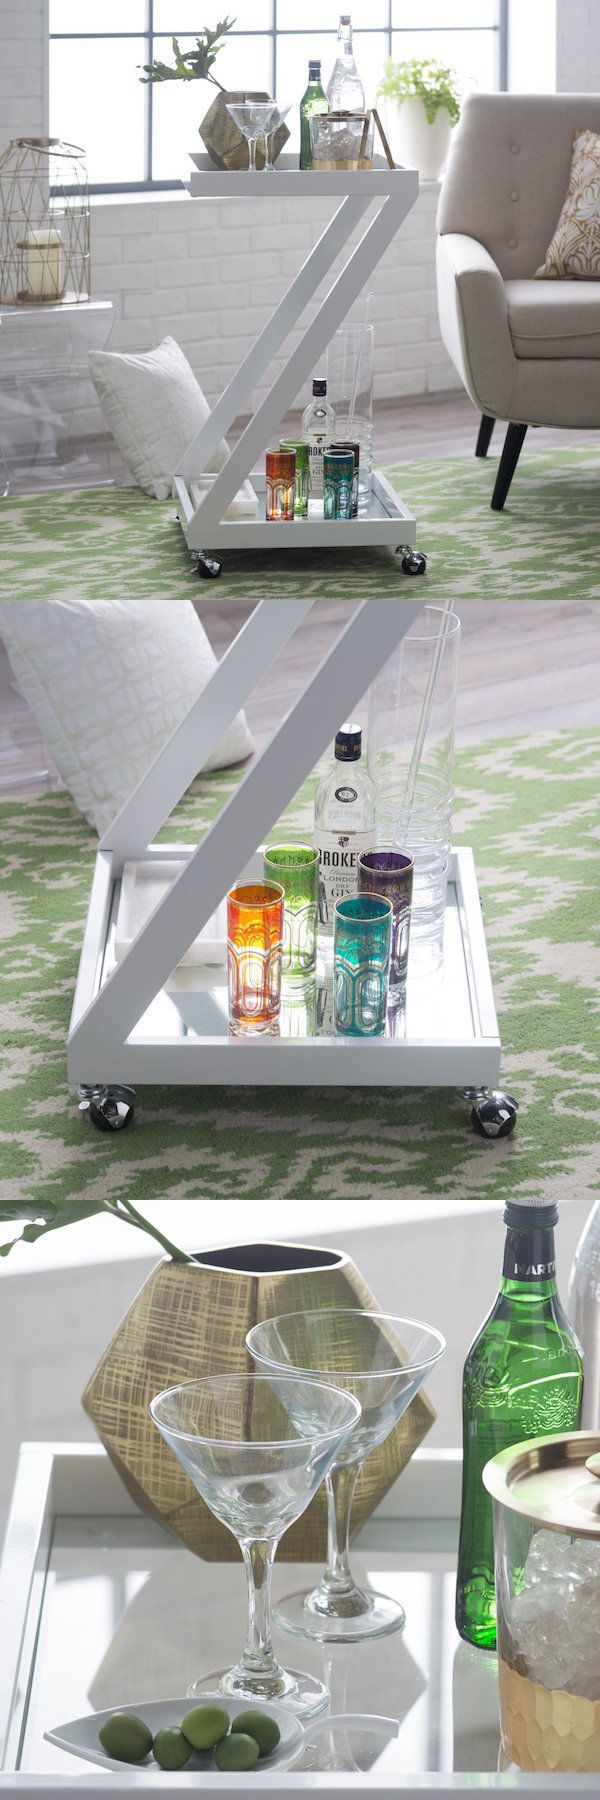 Bar Carts And Serving Carts 183320: Modern Bar Cart Office Furniture Server Outdoor  Patio Accent